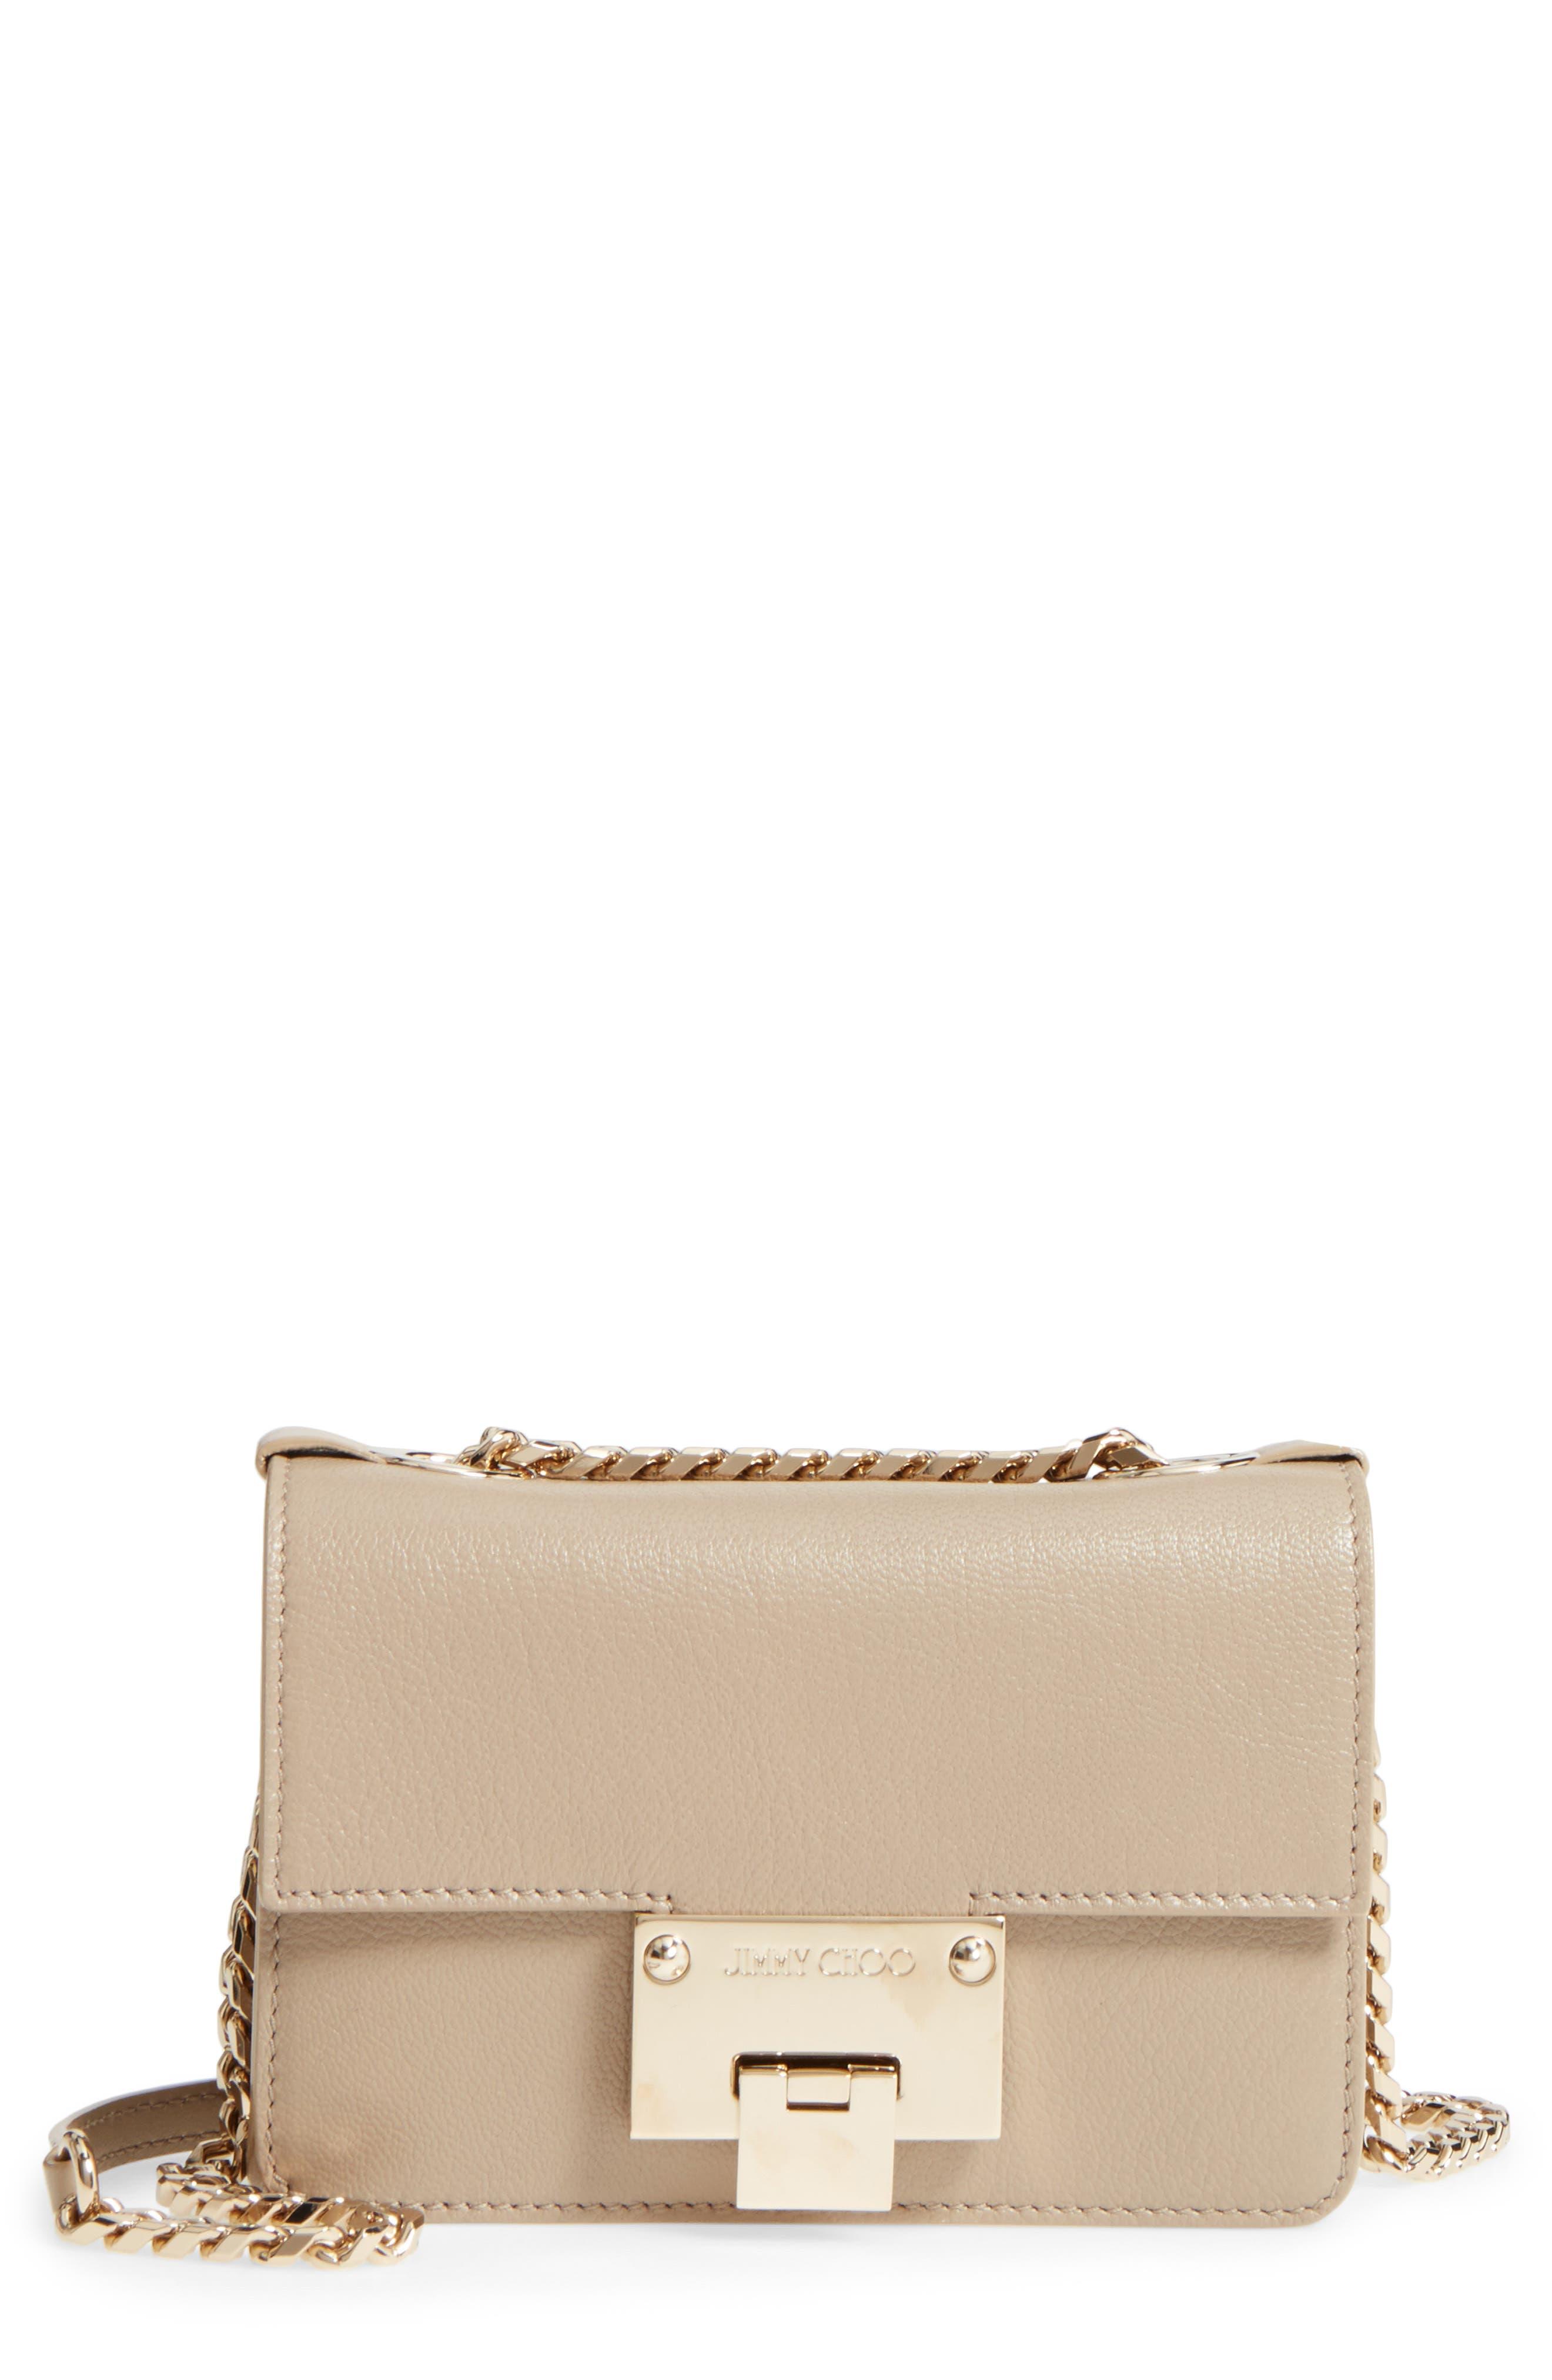 Mini Rebel Leather Crossbody Bag,                         Main,                         color, 201